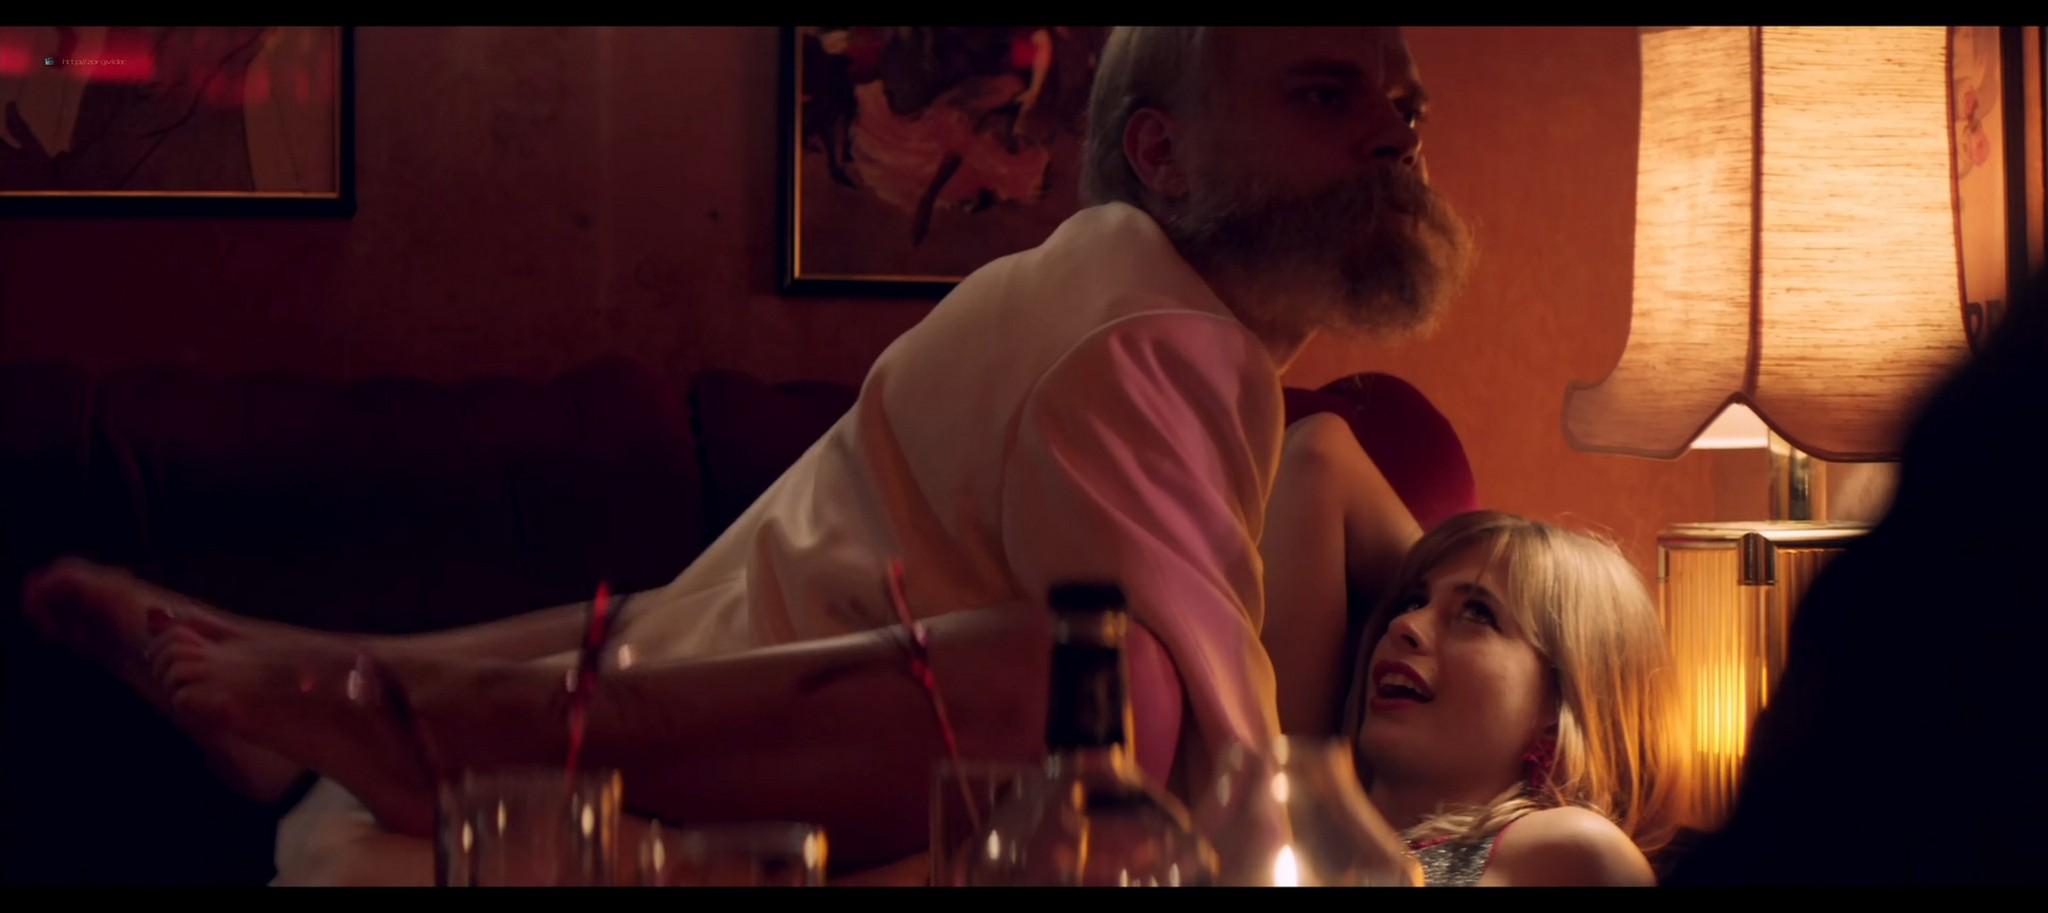 Camilla Cornelia Lehmann nude Sarahsita Lassen, nude and explicit body parts - Spies Og Glistrup (DK-2013) HD 1080p BluRay (17)